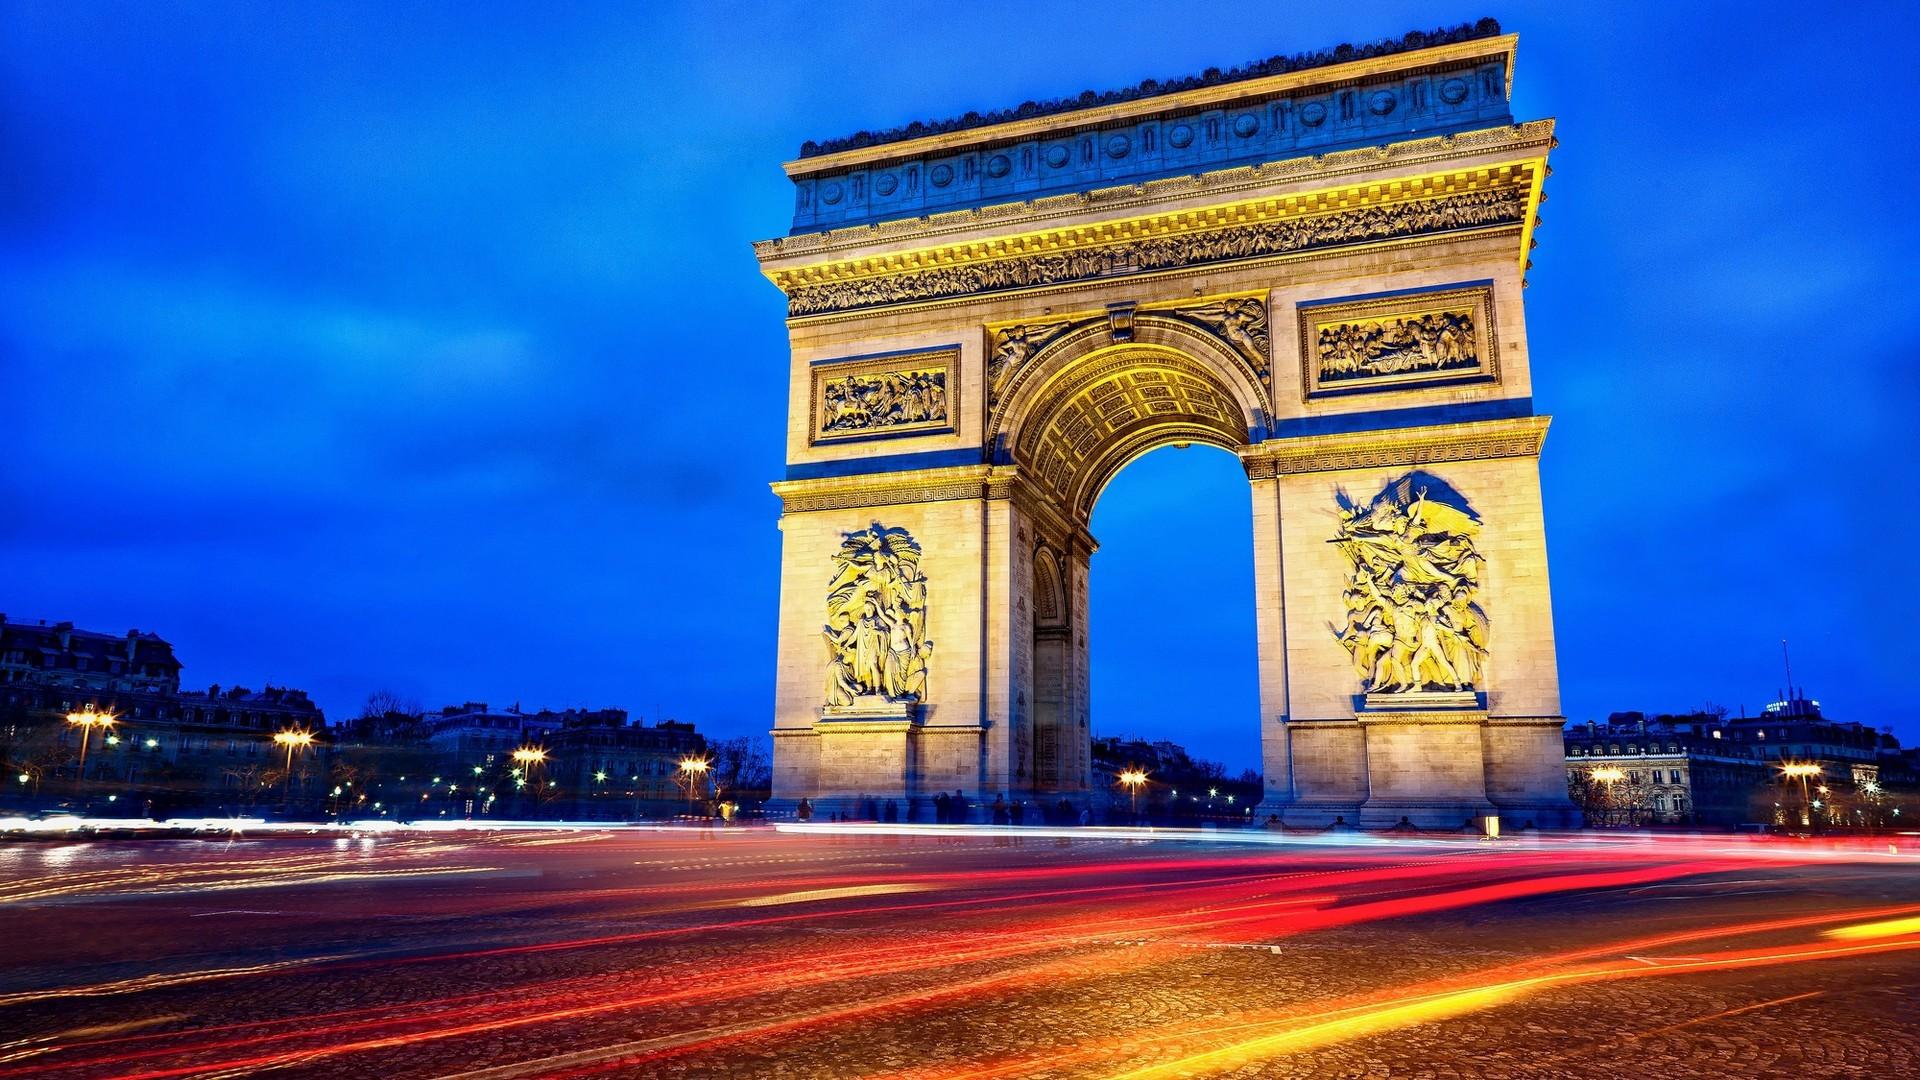 Wallpaper : lights, cityscape, night, architecture, road ...